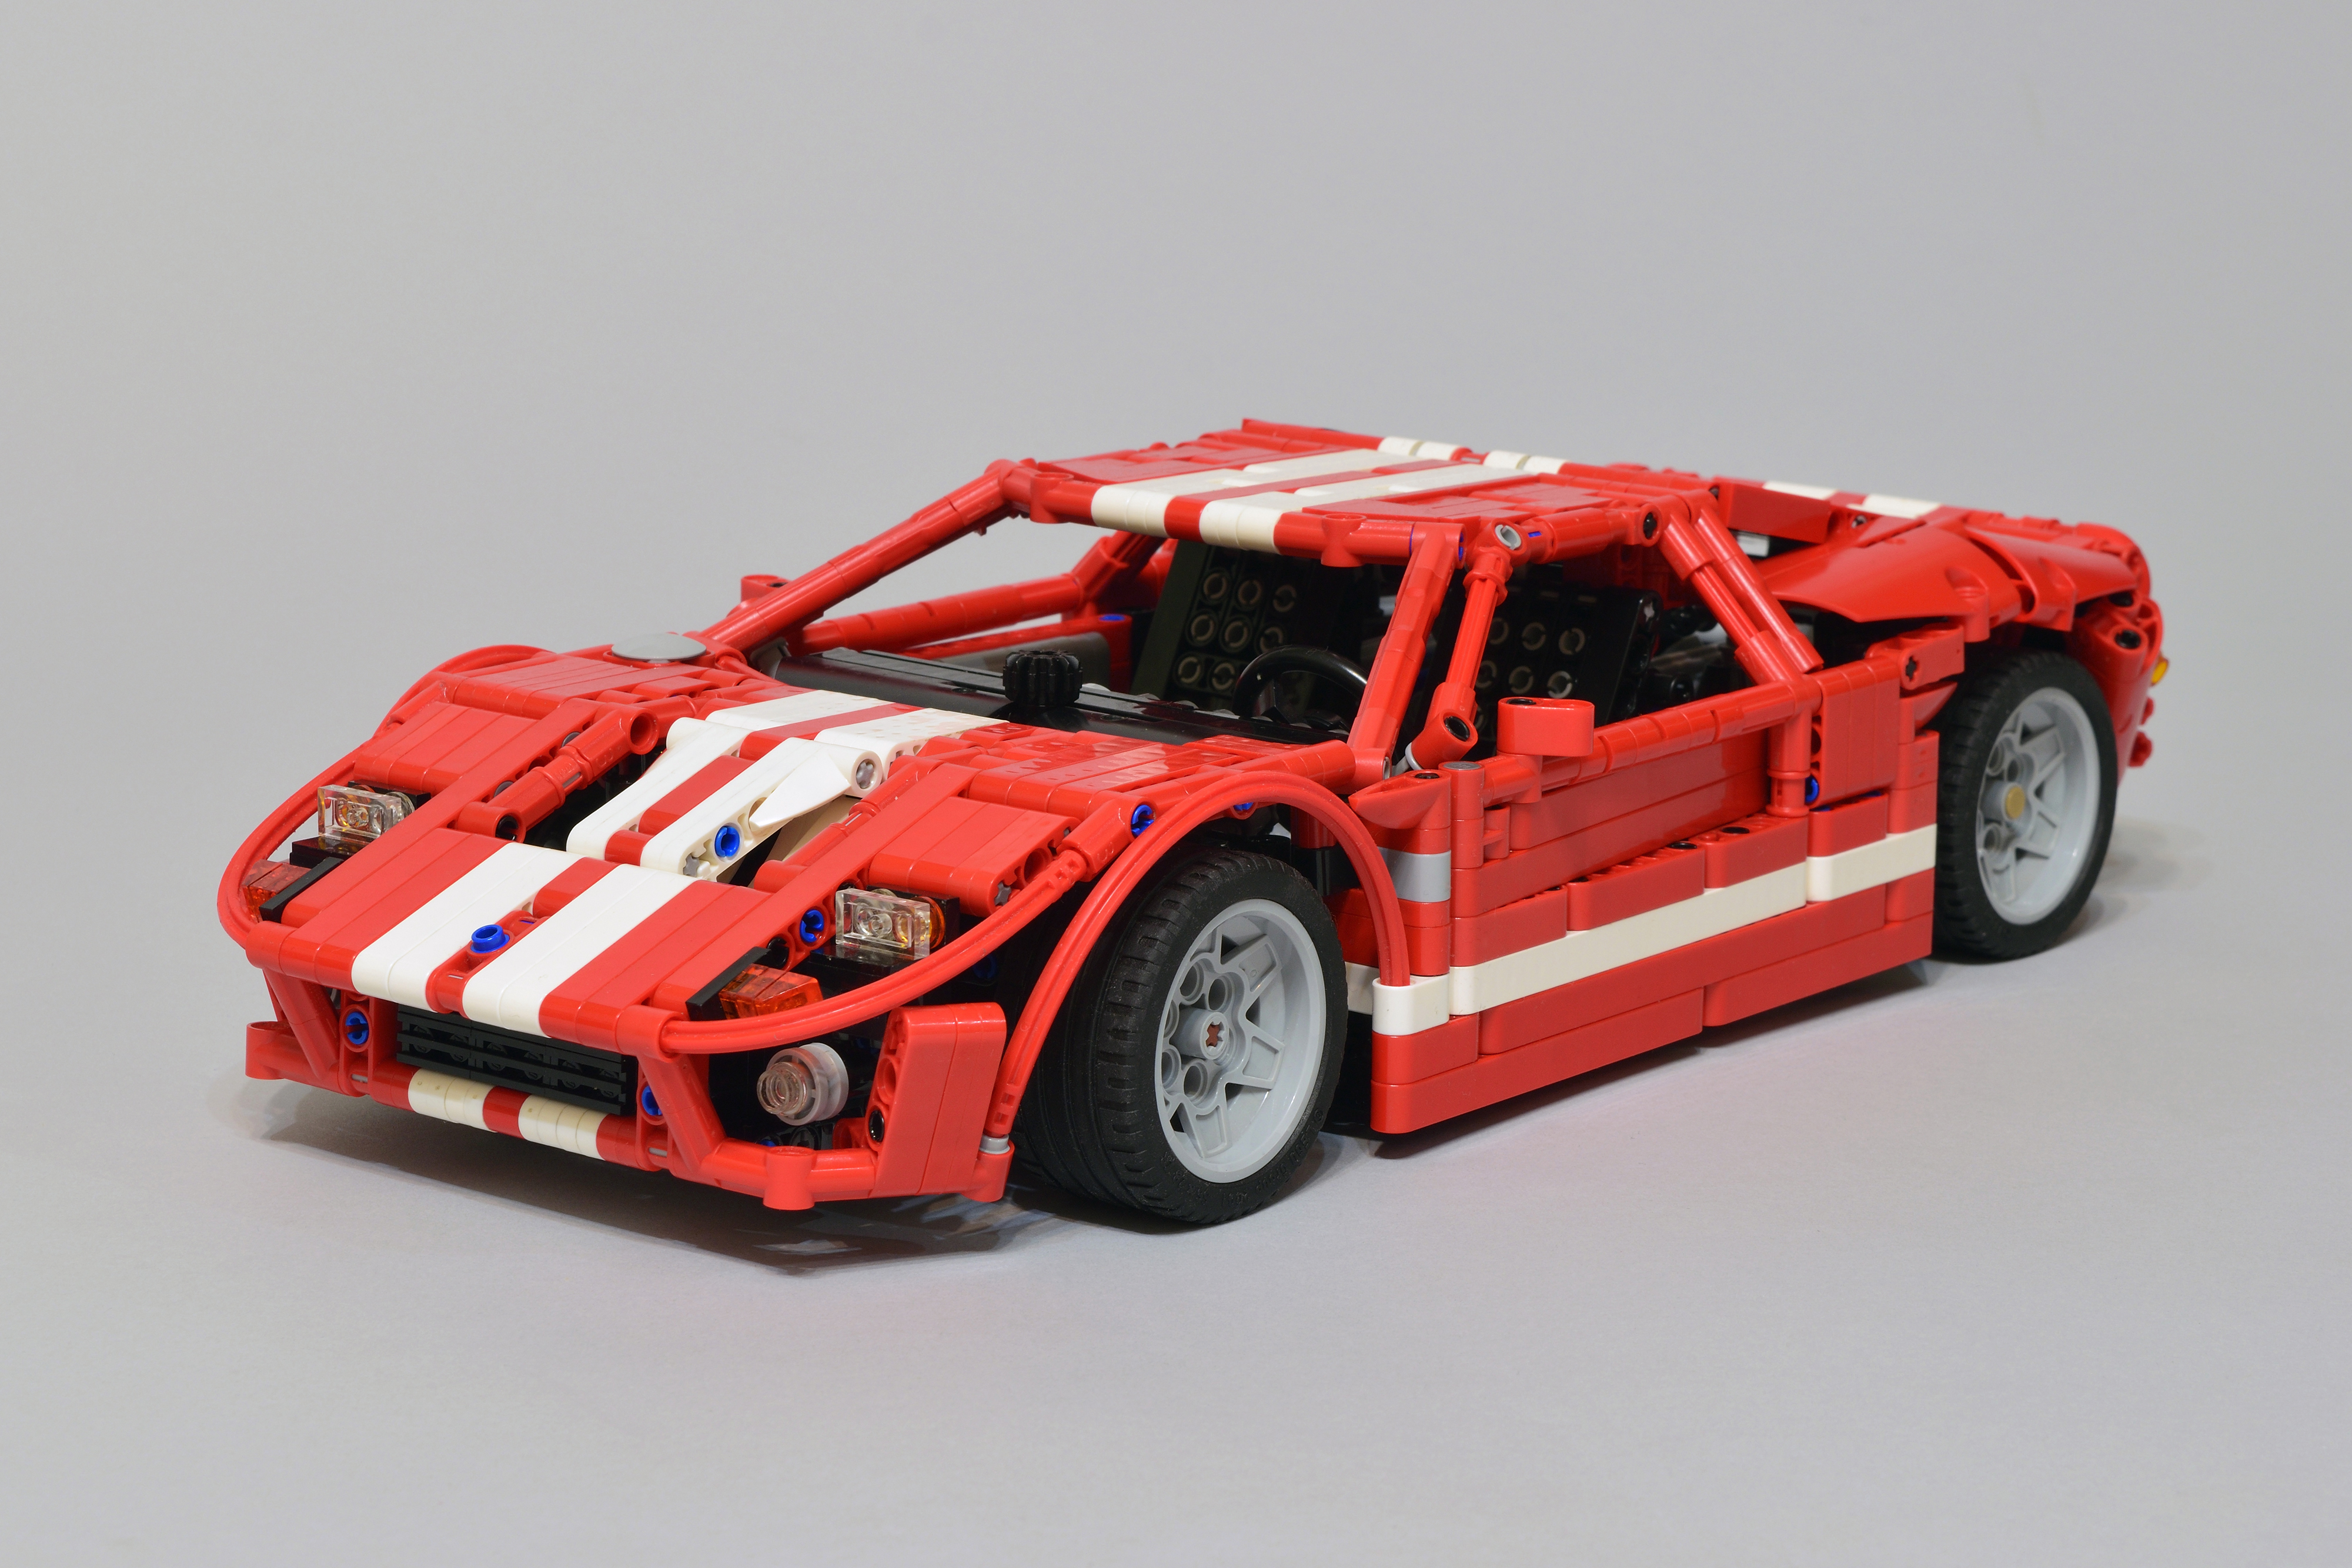 lego technic ford gt the lego car blog. Black Bedroom Furniture Sets. Home Design Ideas